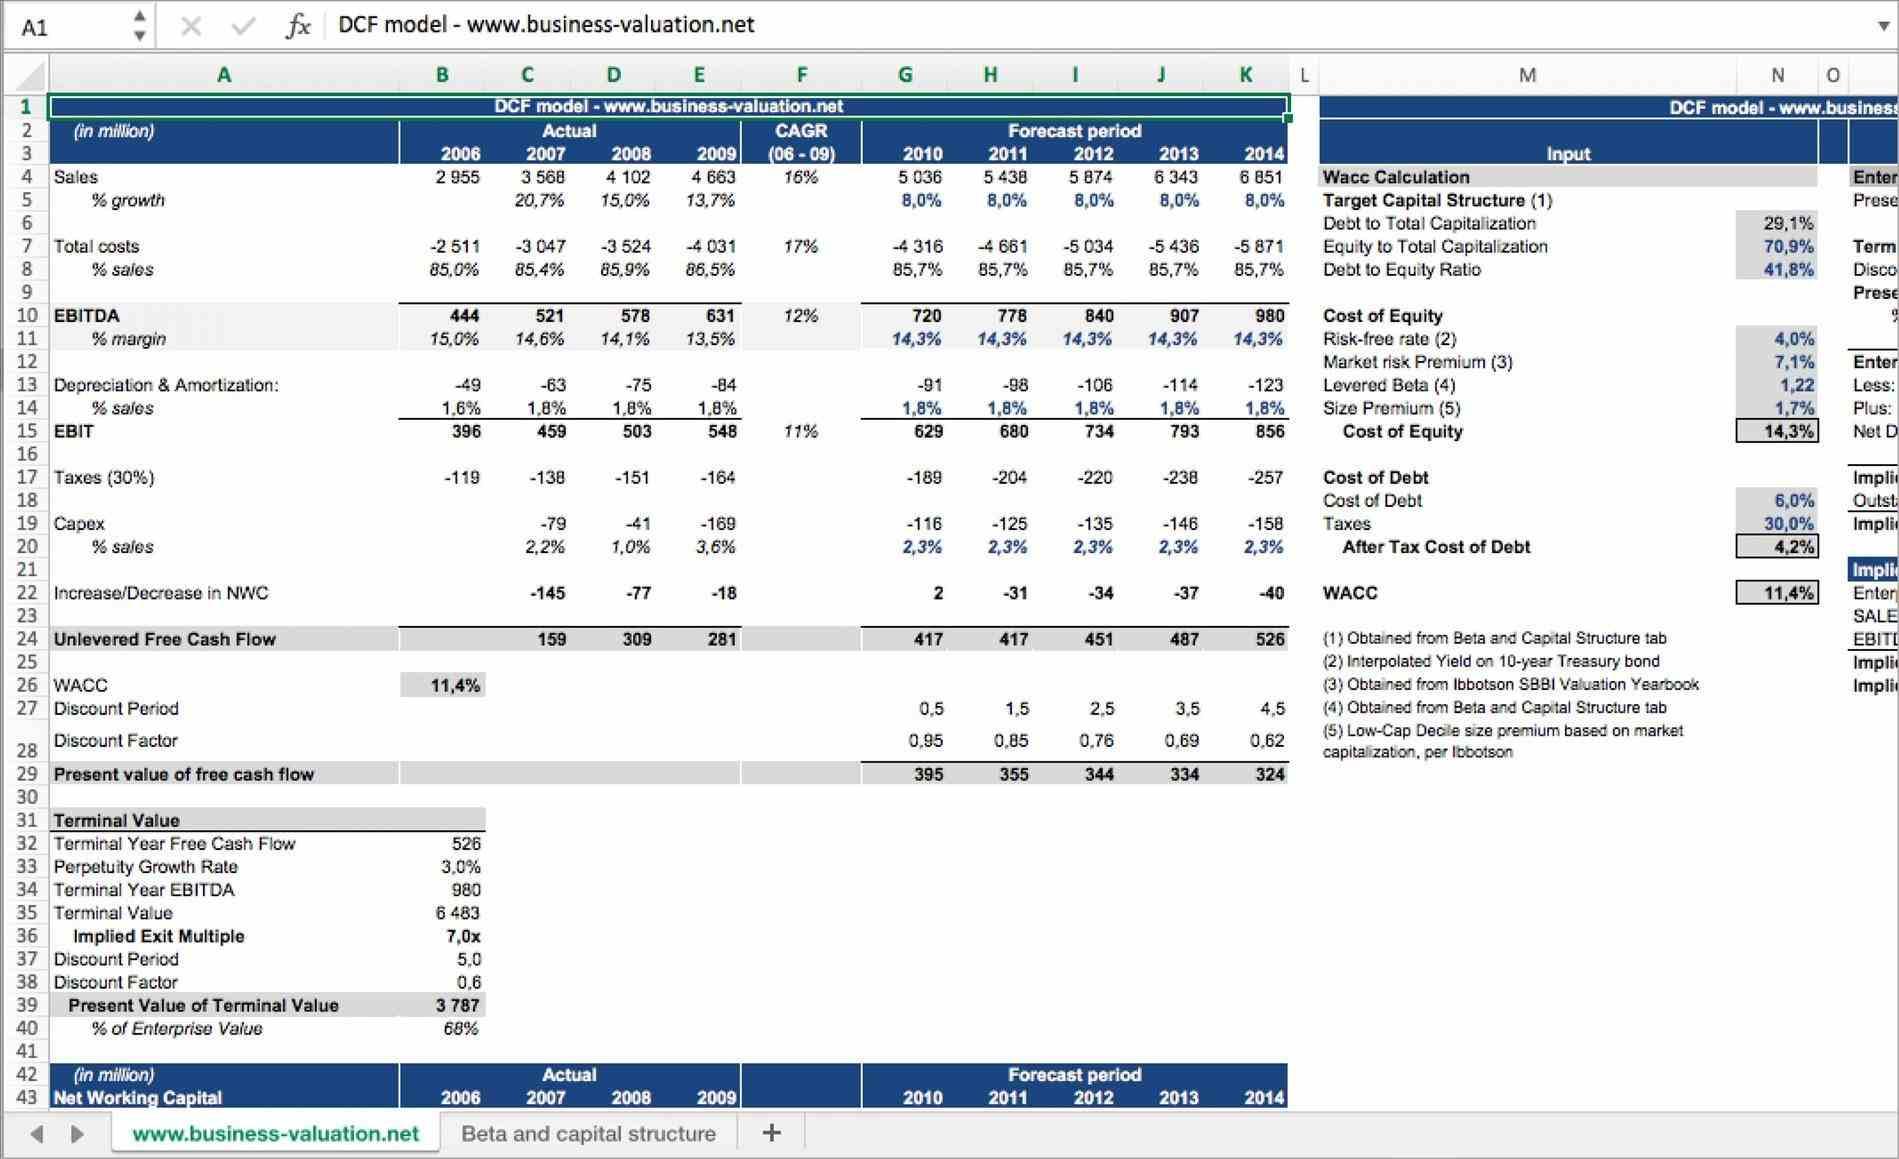 Windows Spreadsheet App For Free Excel Spreadsheet